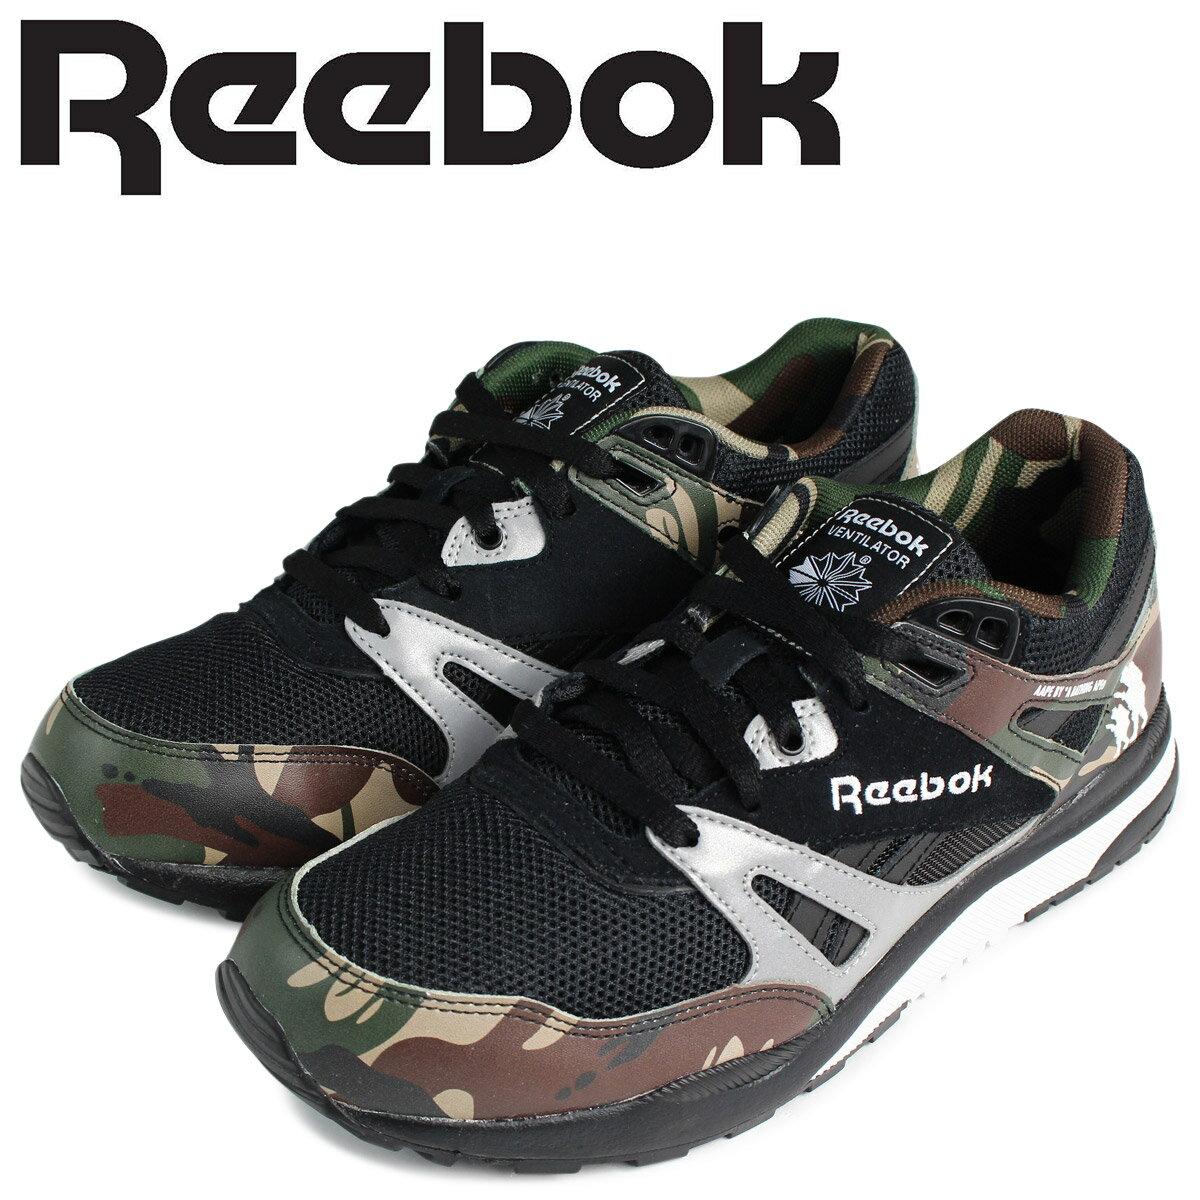 Reebok AAPE BY A BATHING APE ベンチレーター スニーカー リーボック エーエイプバイアベイシングエイプ VENTILATOR AFFILIATES CAMO V63541 メンズ 靴 ブラック カモ 迷彩 コラボ